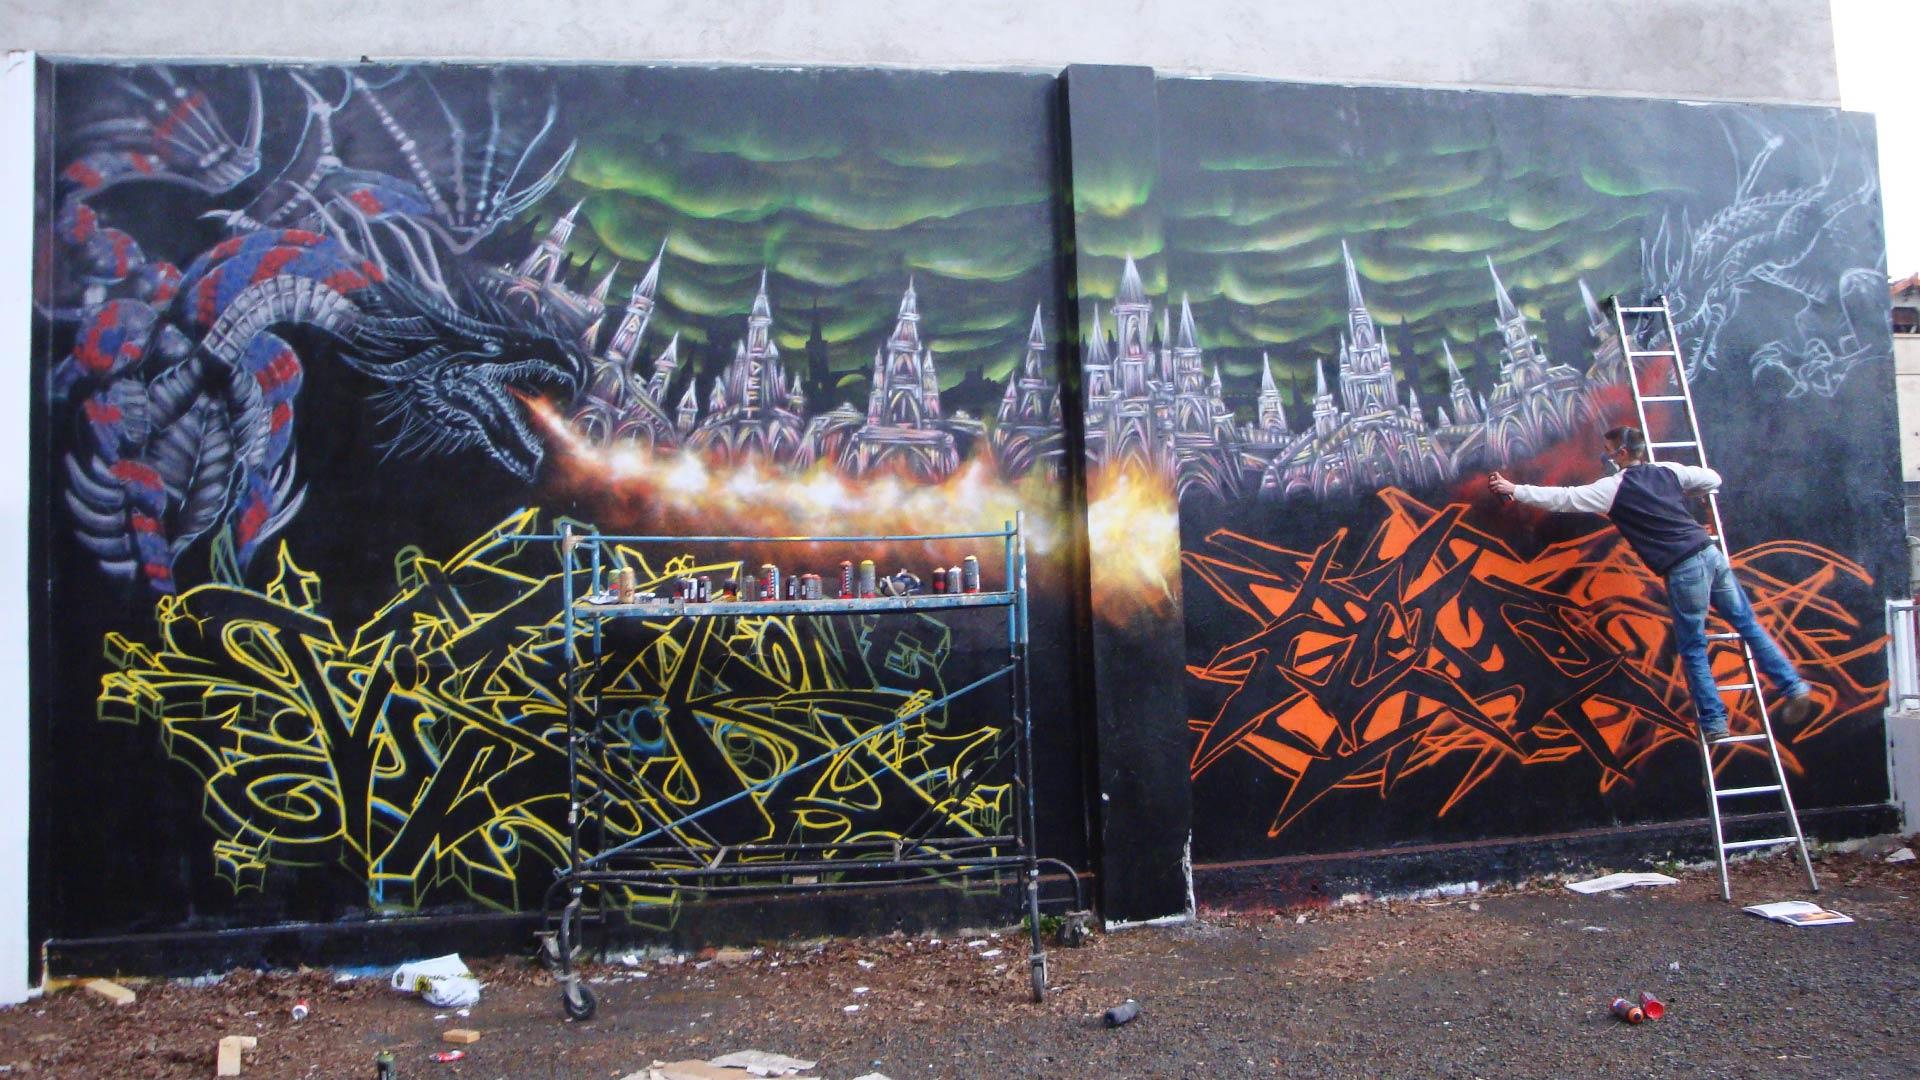 Vizer, Awok, Epok & Deft - Fresque Dragon - Graffiti - Clermont-Ferrand